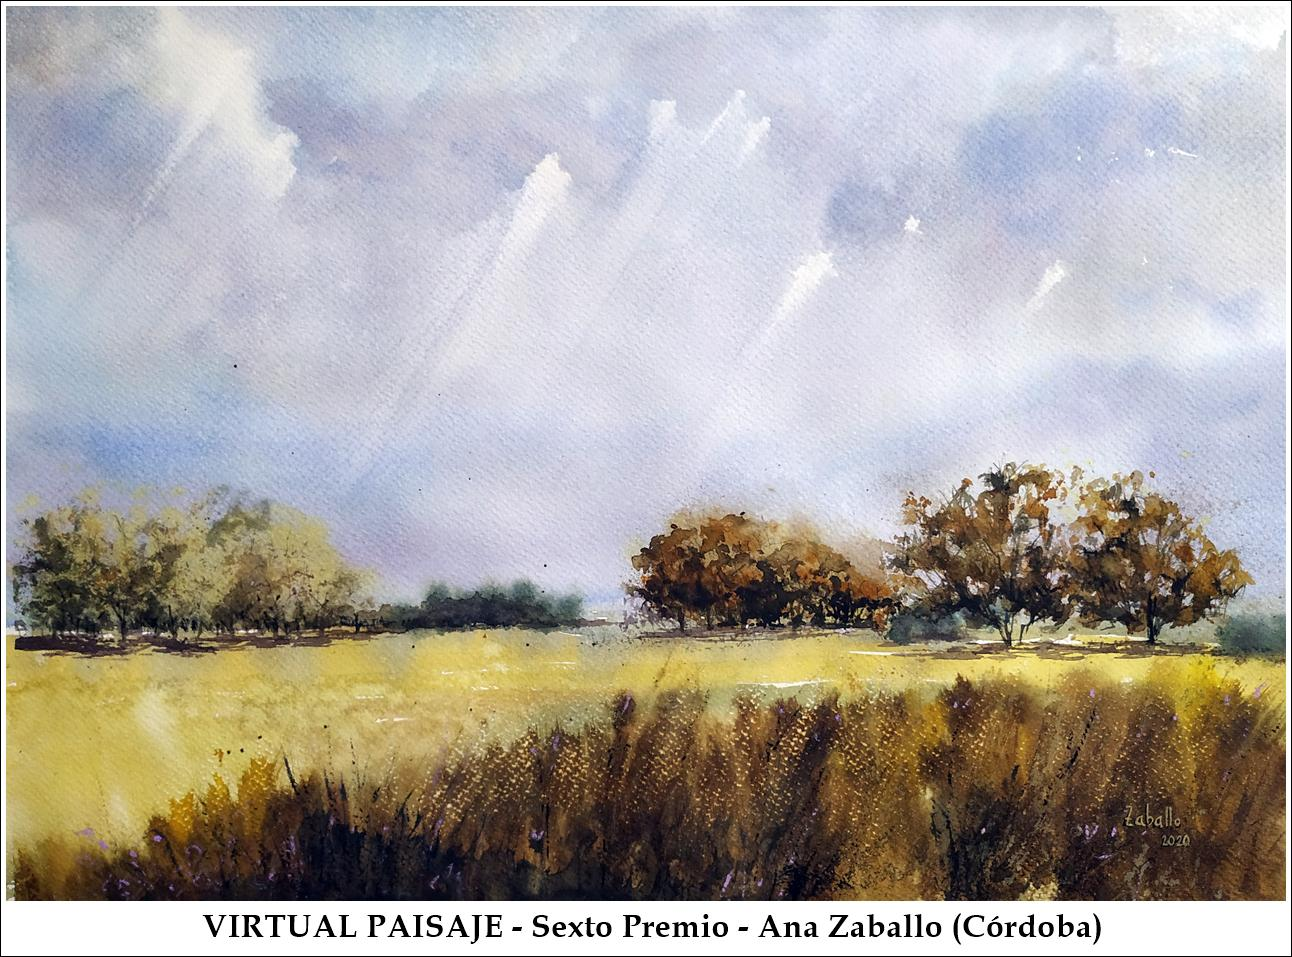 VirtualPaisaje - SextoPremio - AnaZaballo